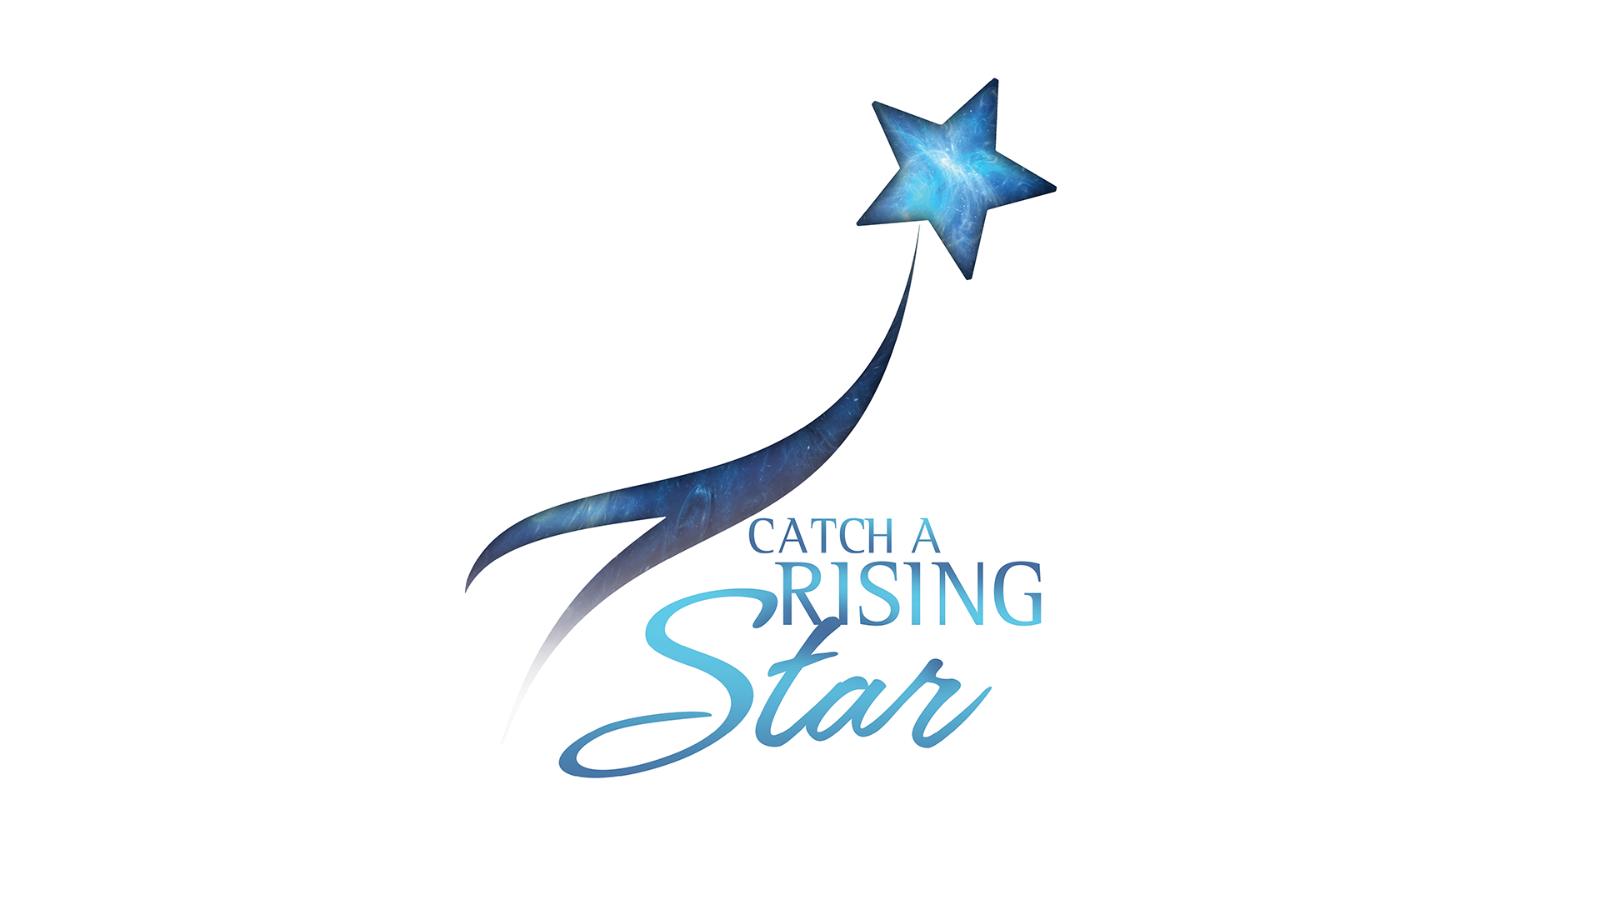 Catch a Rising Star